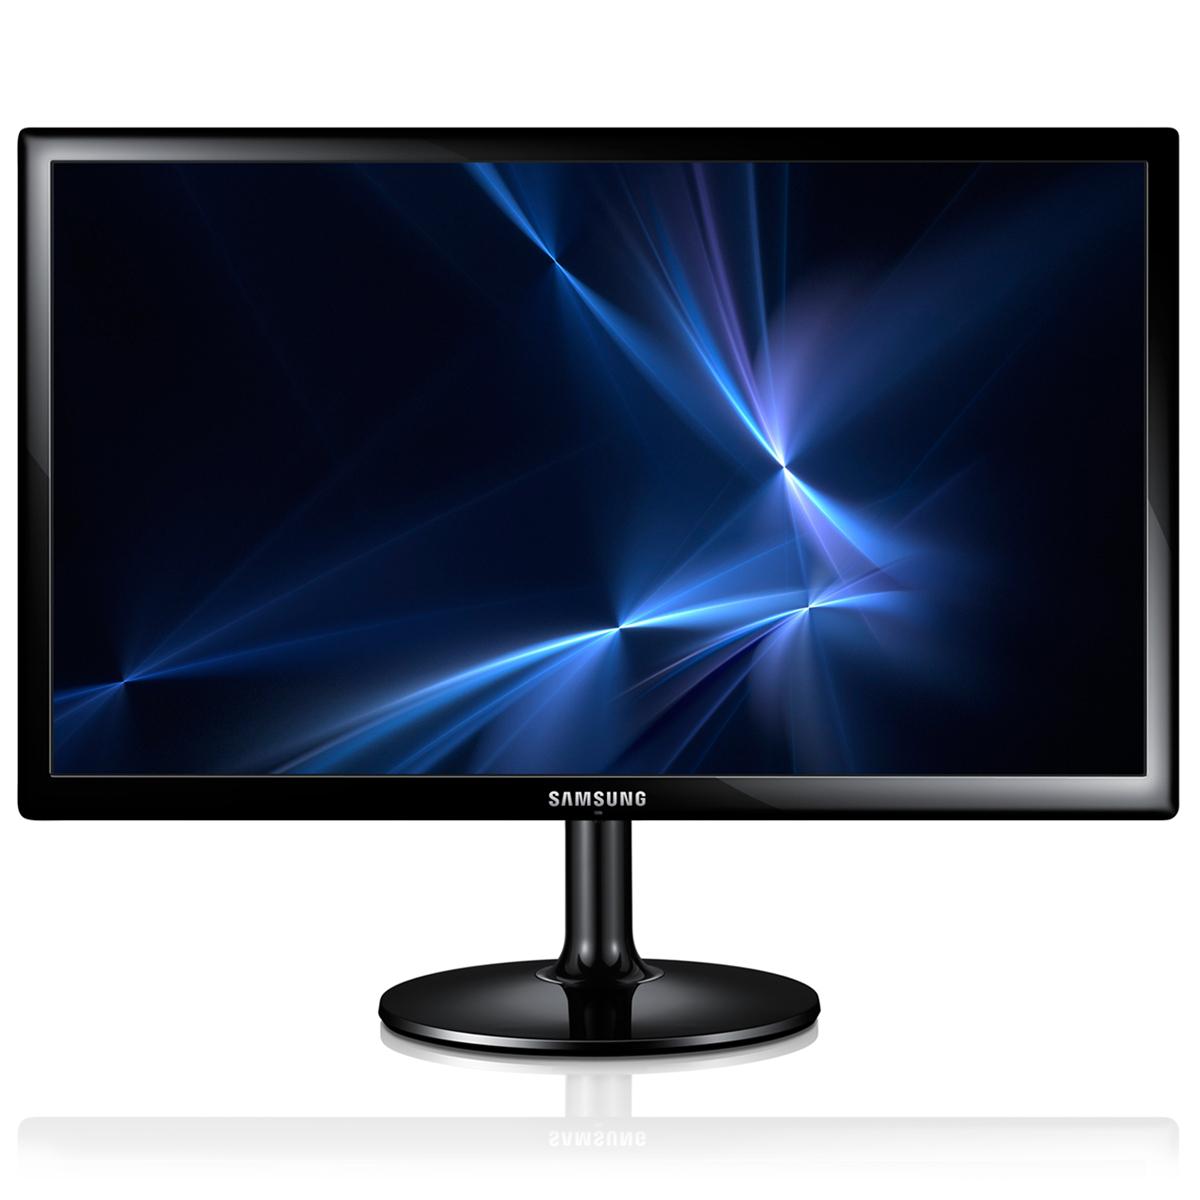 "Ecran PC Samsung 21.5"" LED - SyncMaster S22C350H - Full HD"